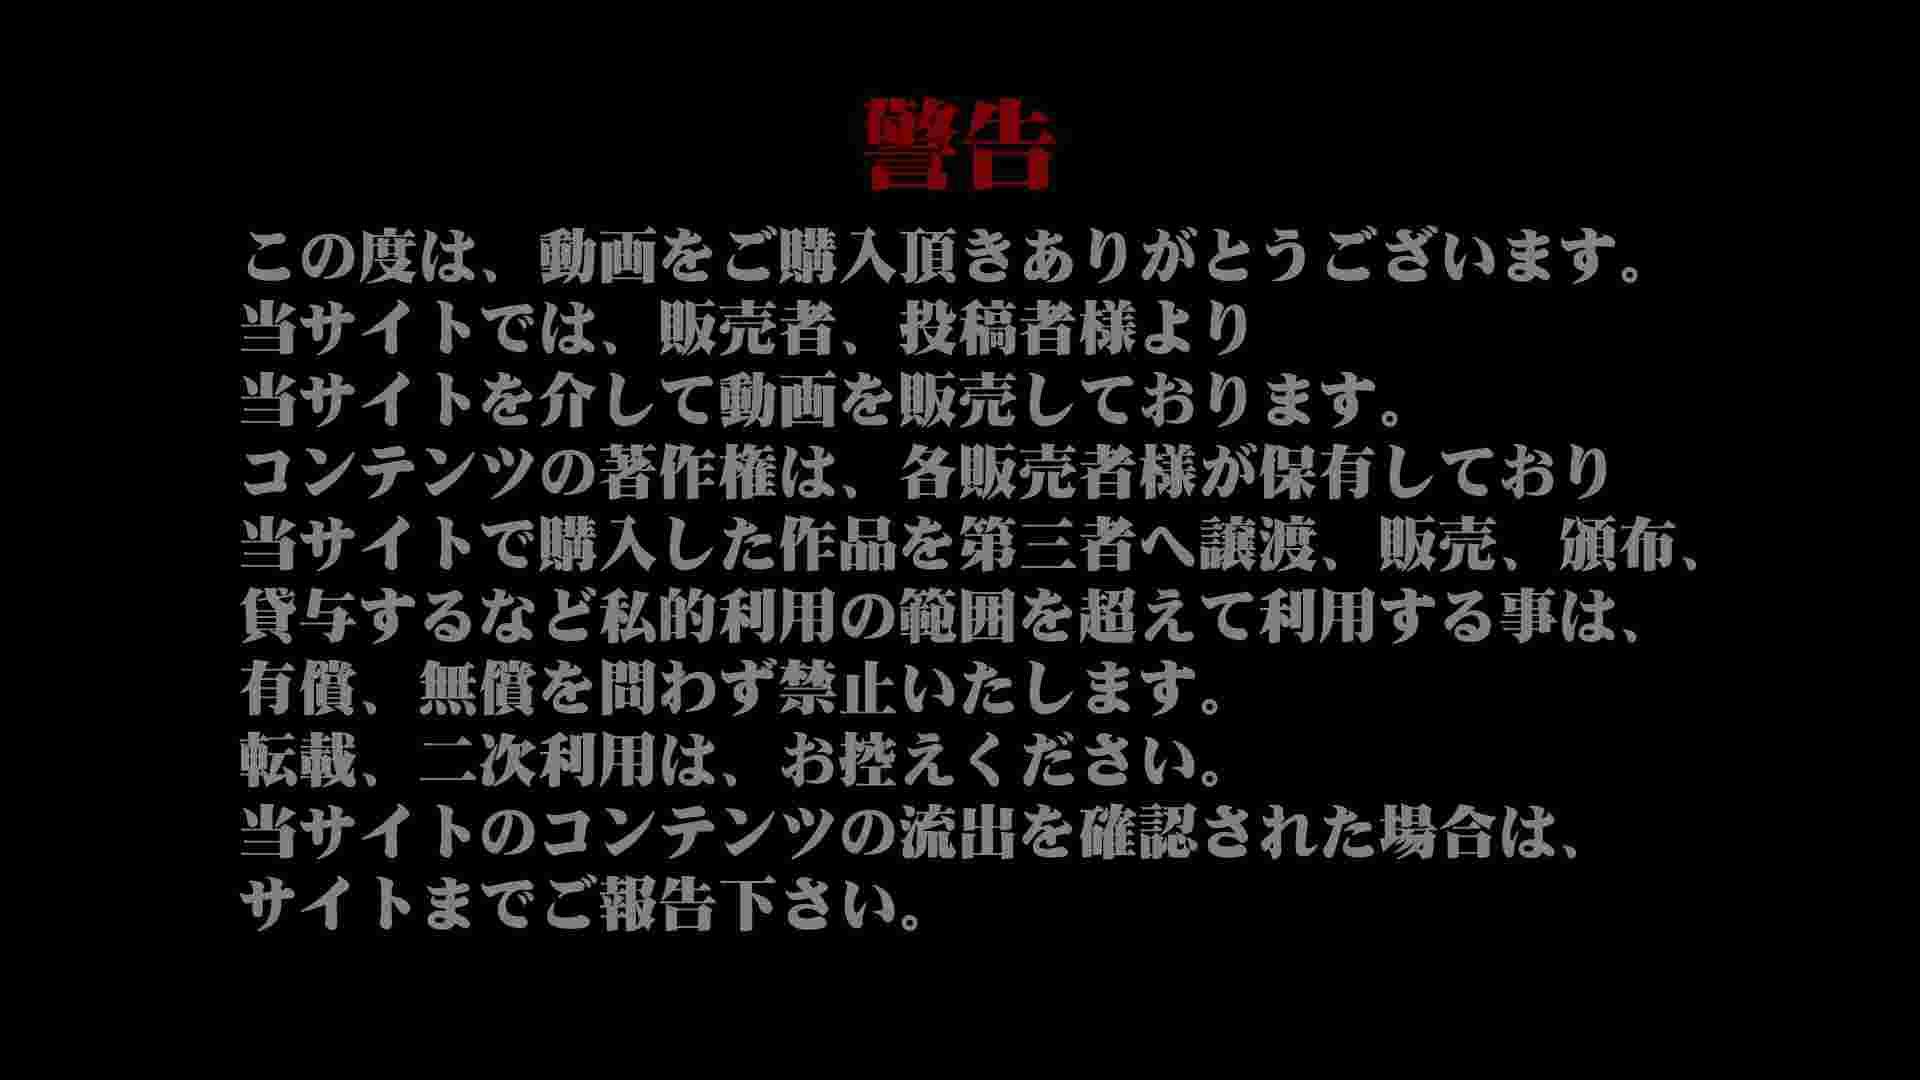 Aquaな露天風呂Vol.981 露天風呂編  104PIX 2